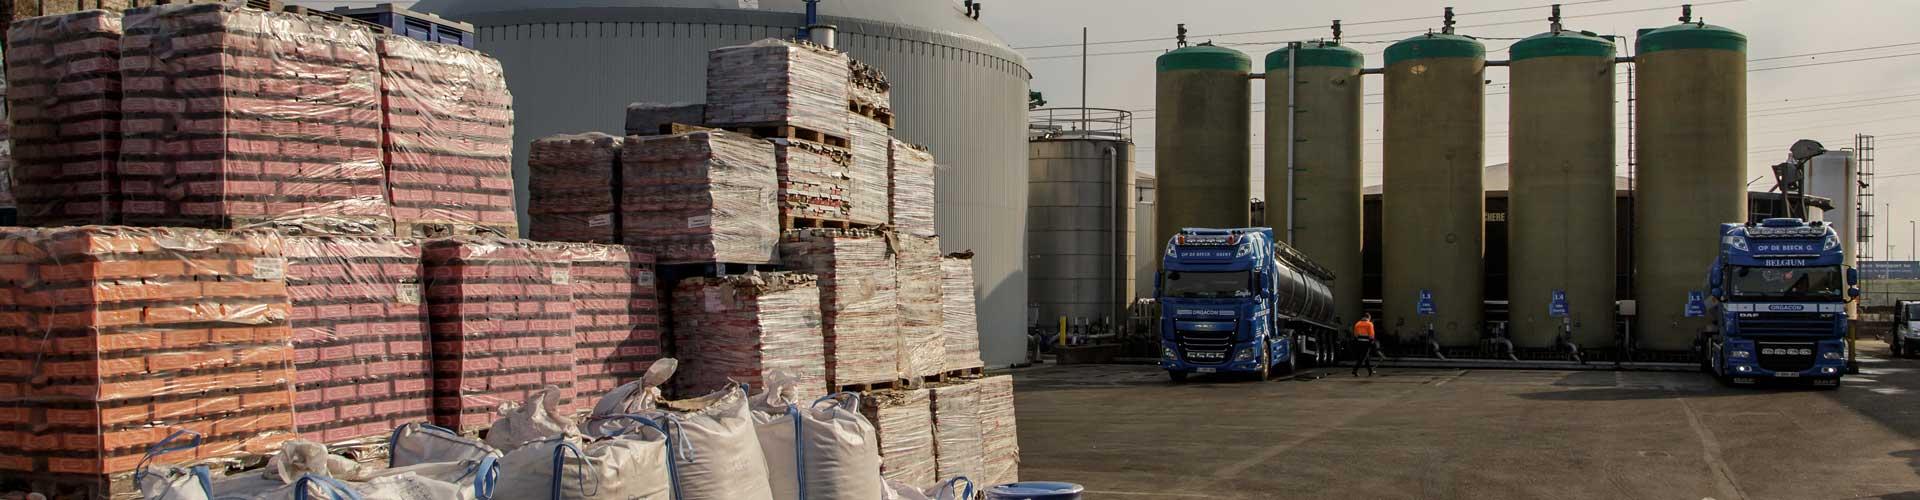 Group Op de Beeck - Biogas Solutions NV